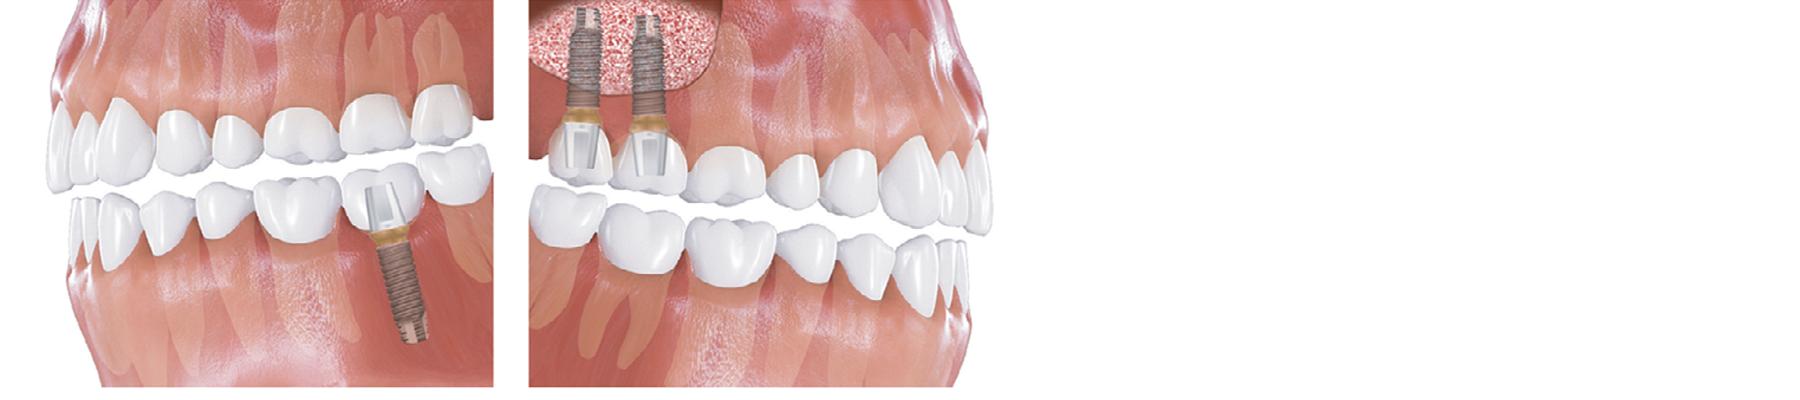 Lower molar & Maxillary sinus